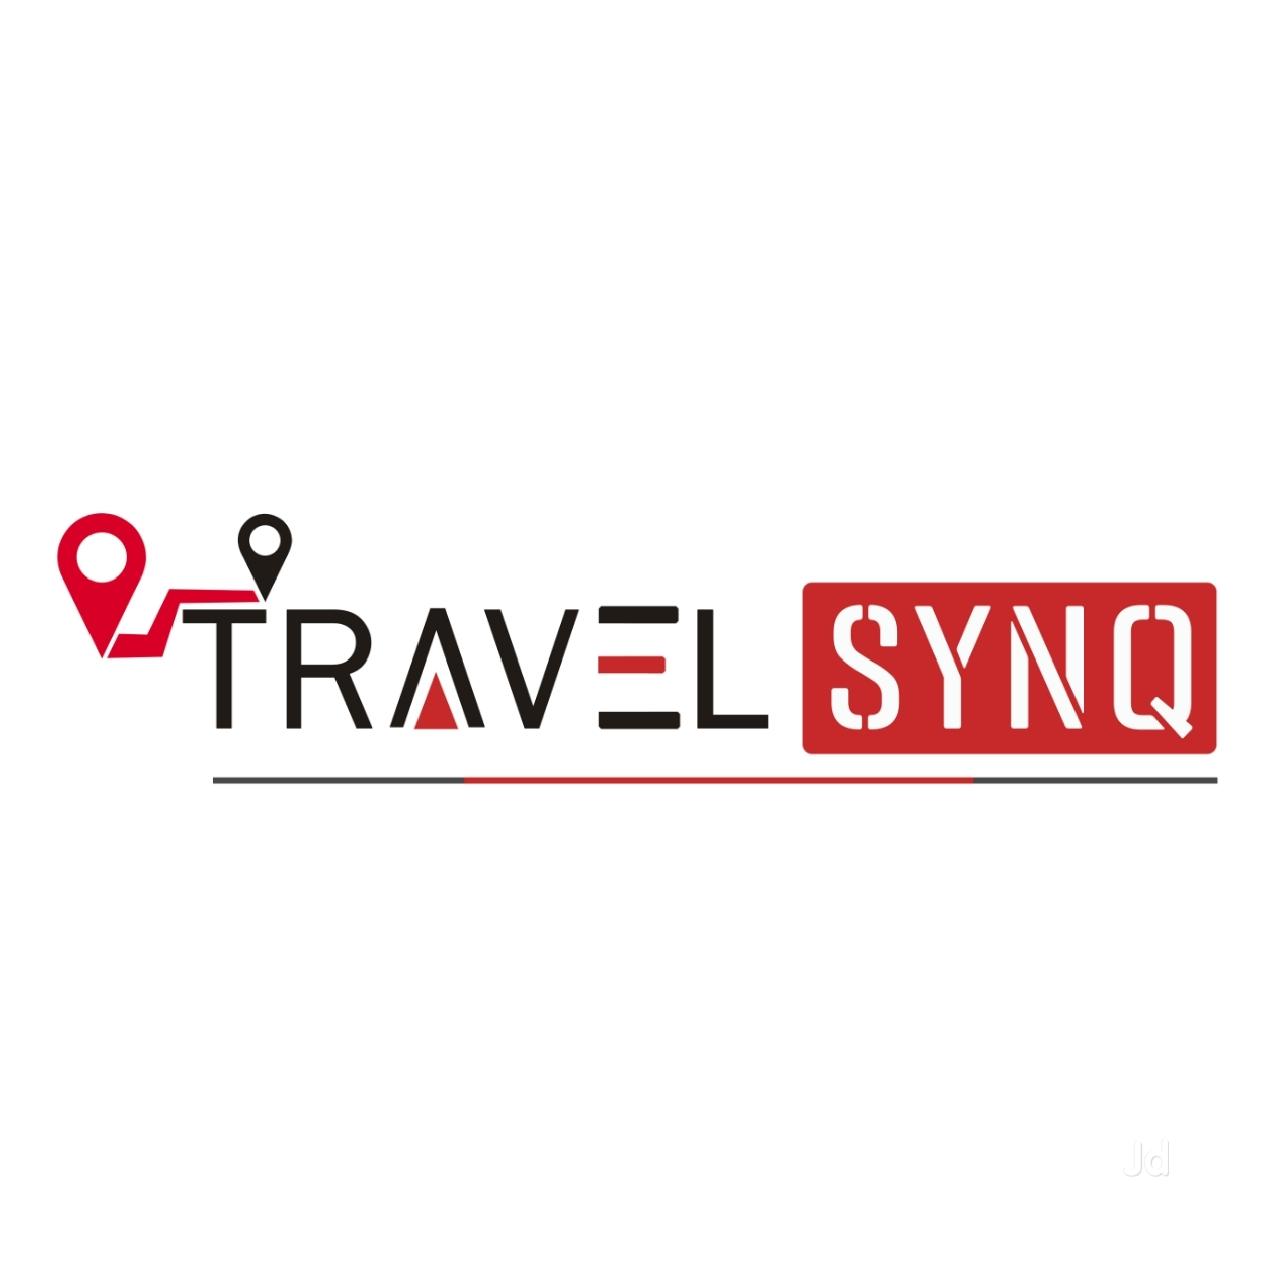 Travel Synq